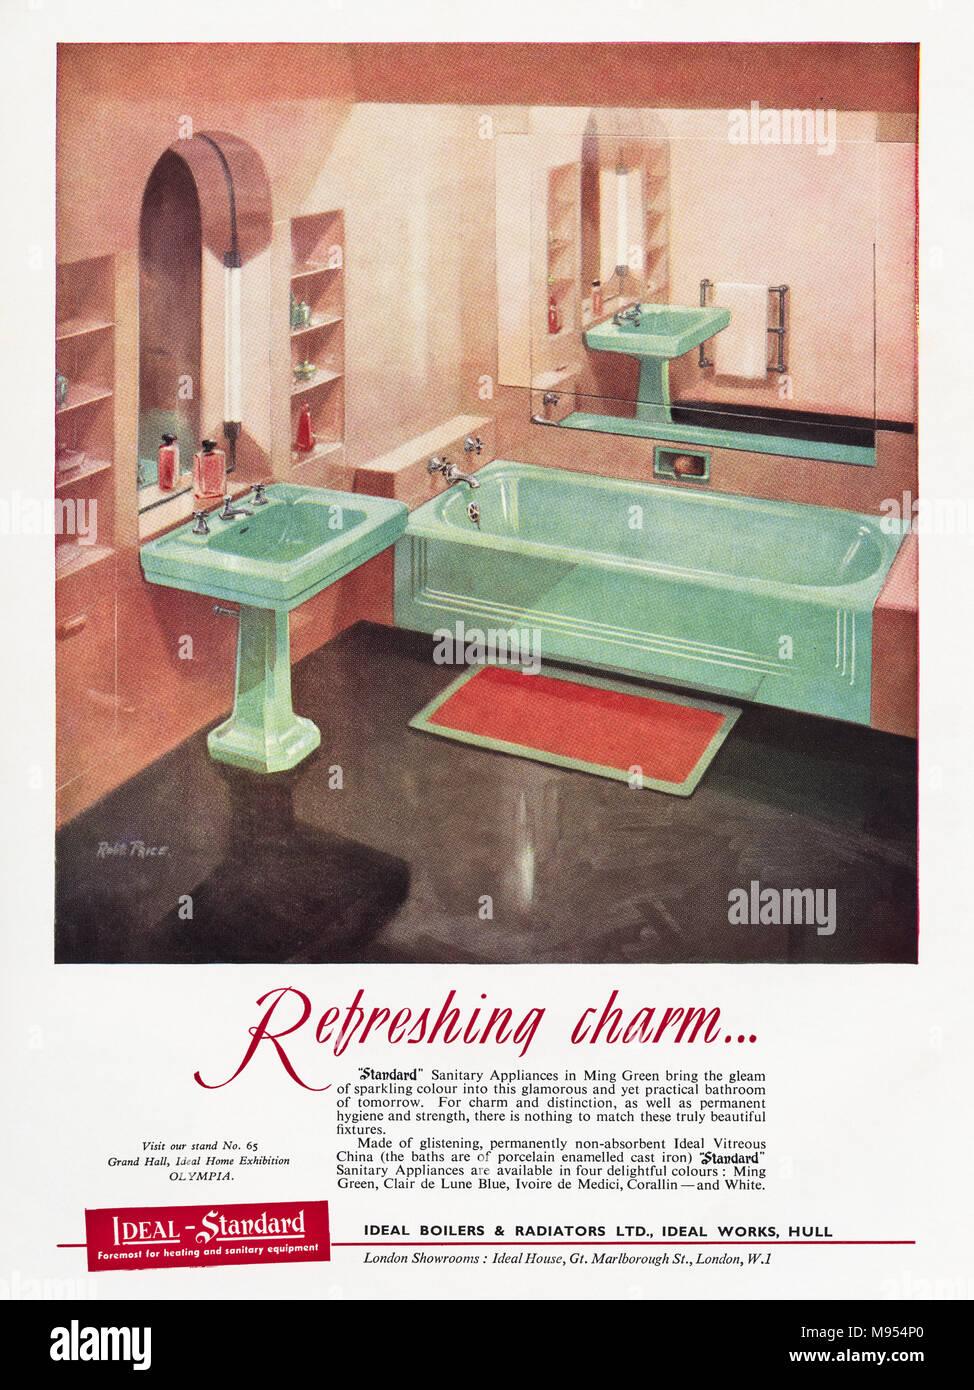 1950s original old vintage advertisement advertising Ideal-Standard bathrooms of Hull England UK in English magazine circa 1951 - Stock Image